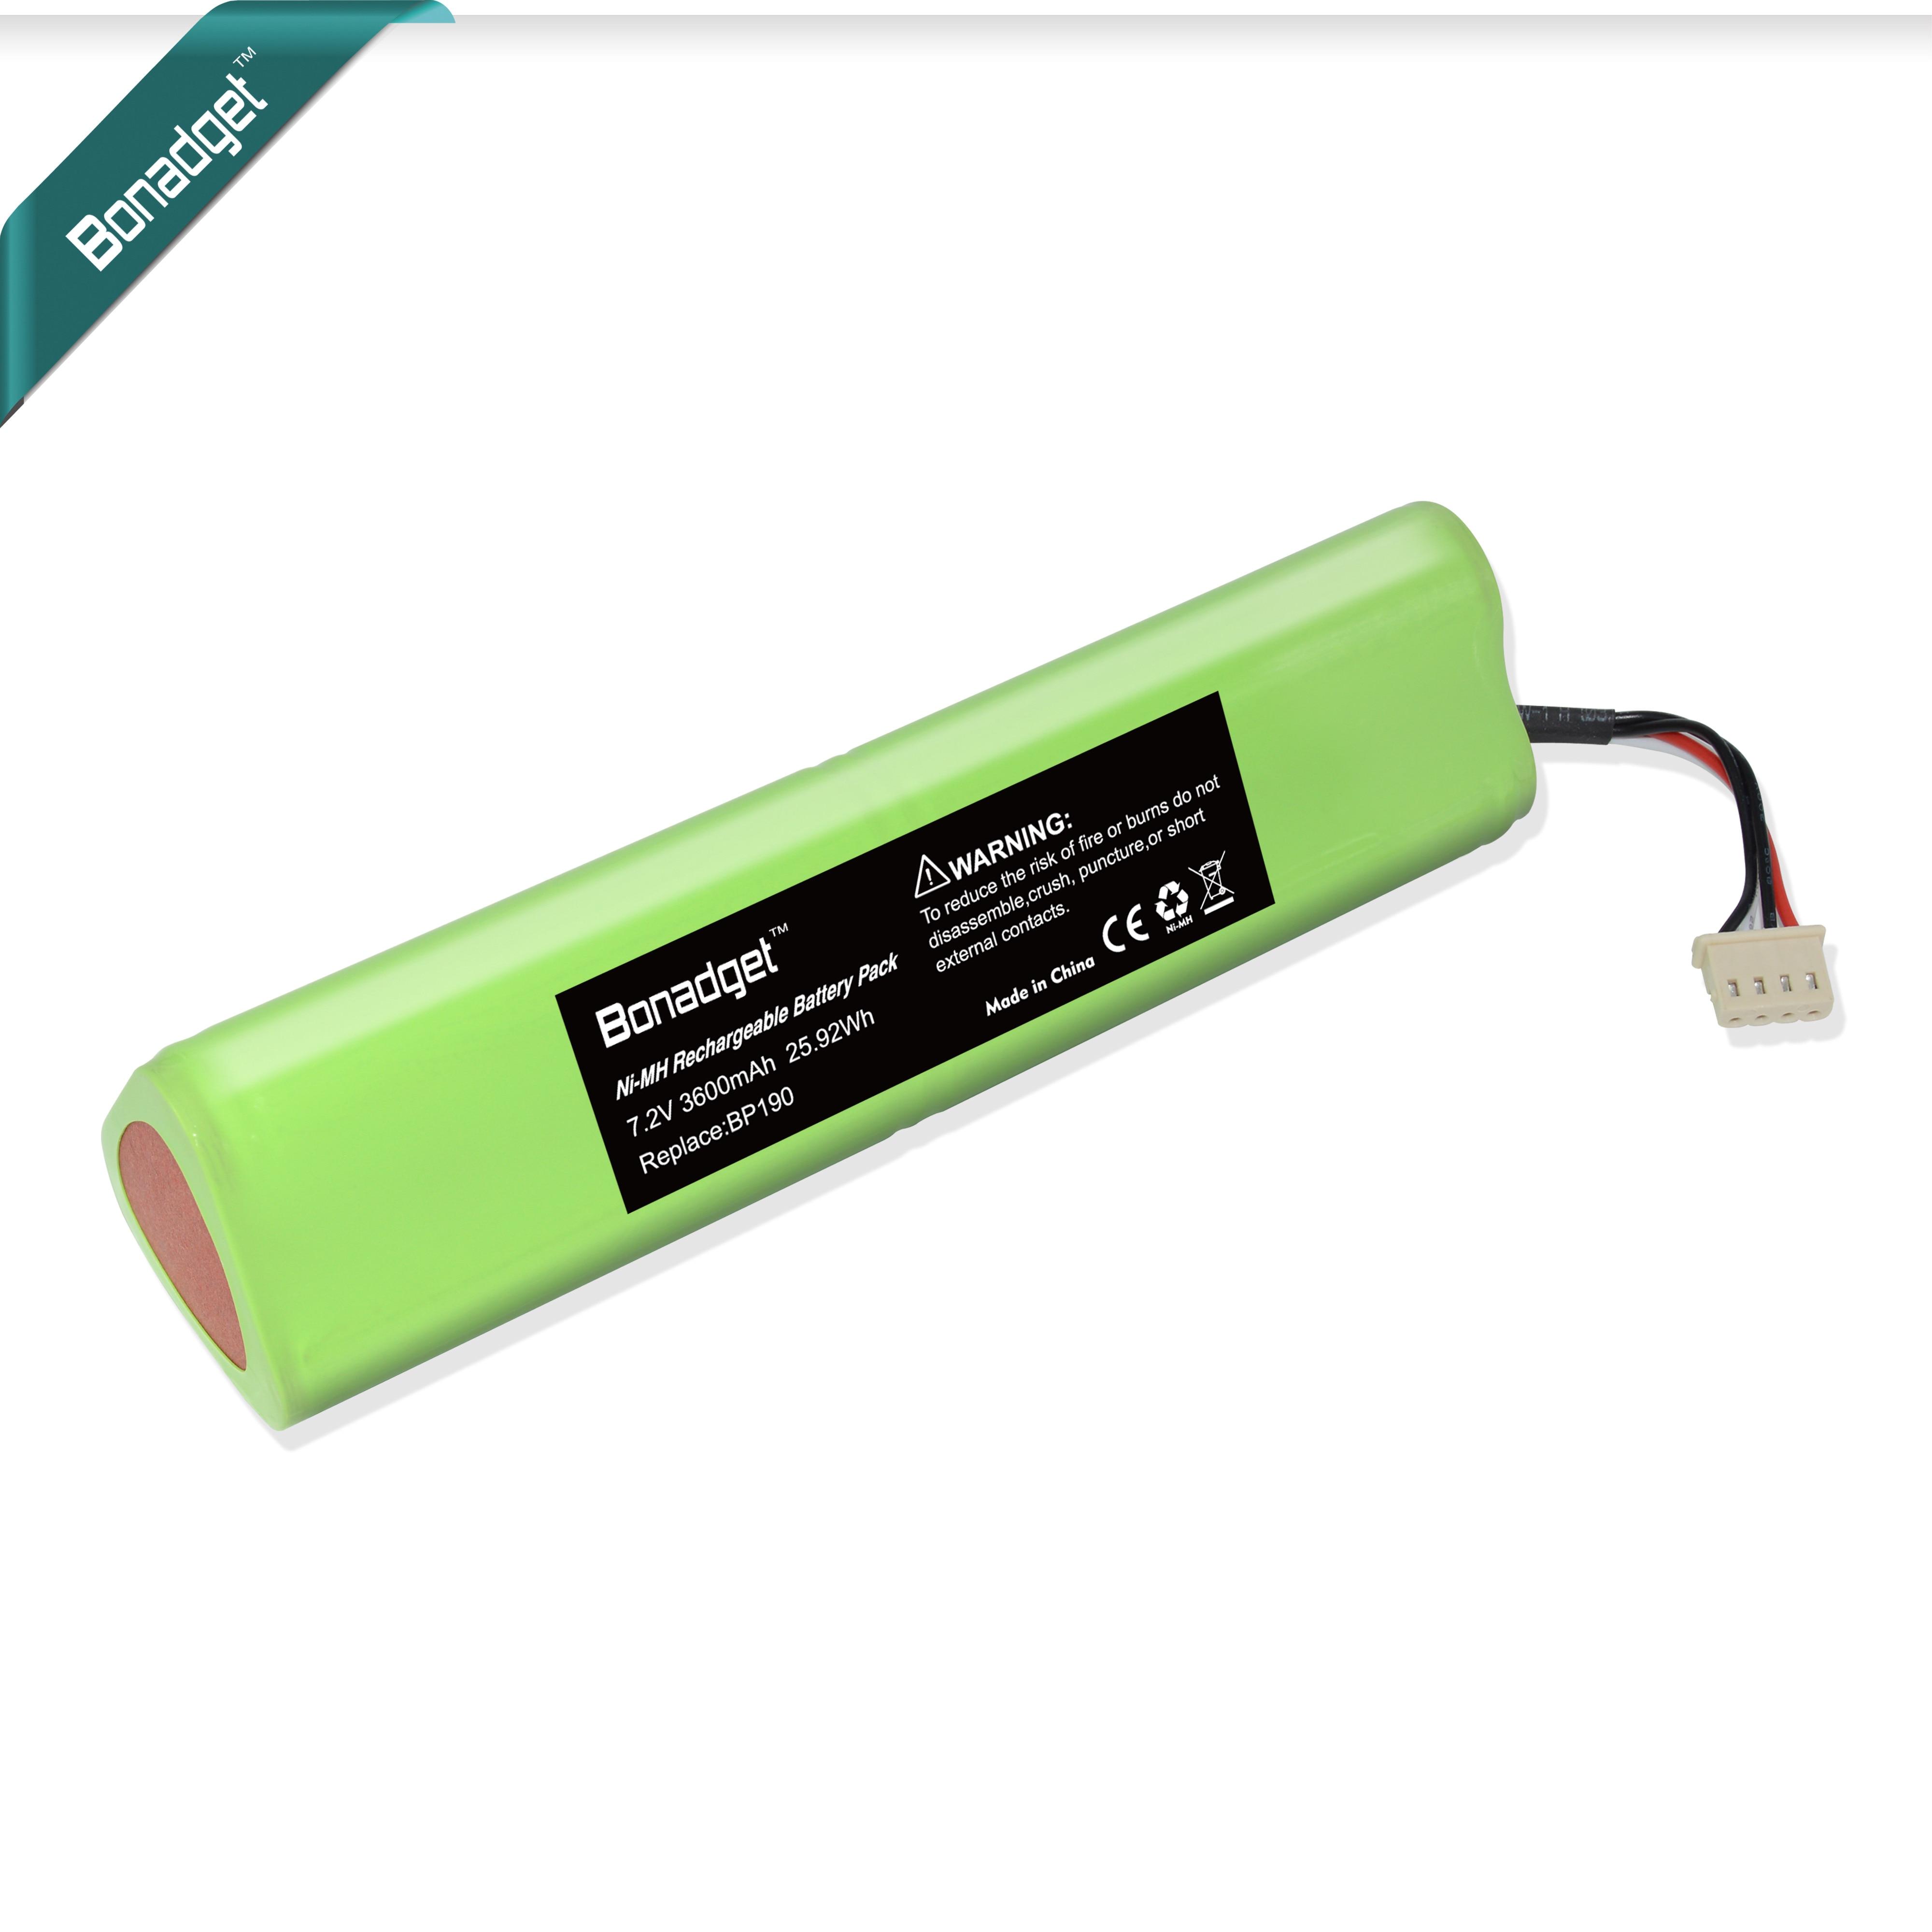 Ni-MH Battery for Fluke Analyzers 435 BP-190 B11432 BP190 Analyzers 434 430 NEW